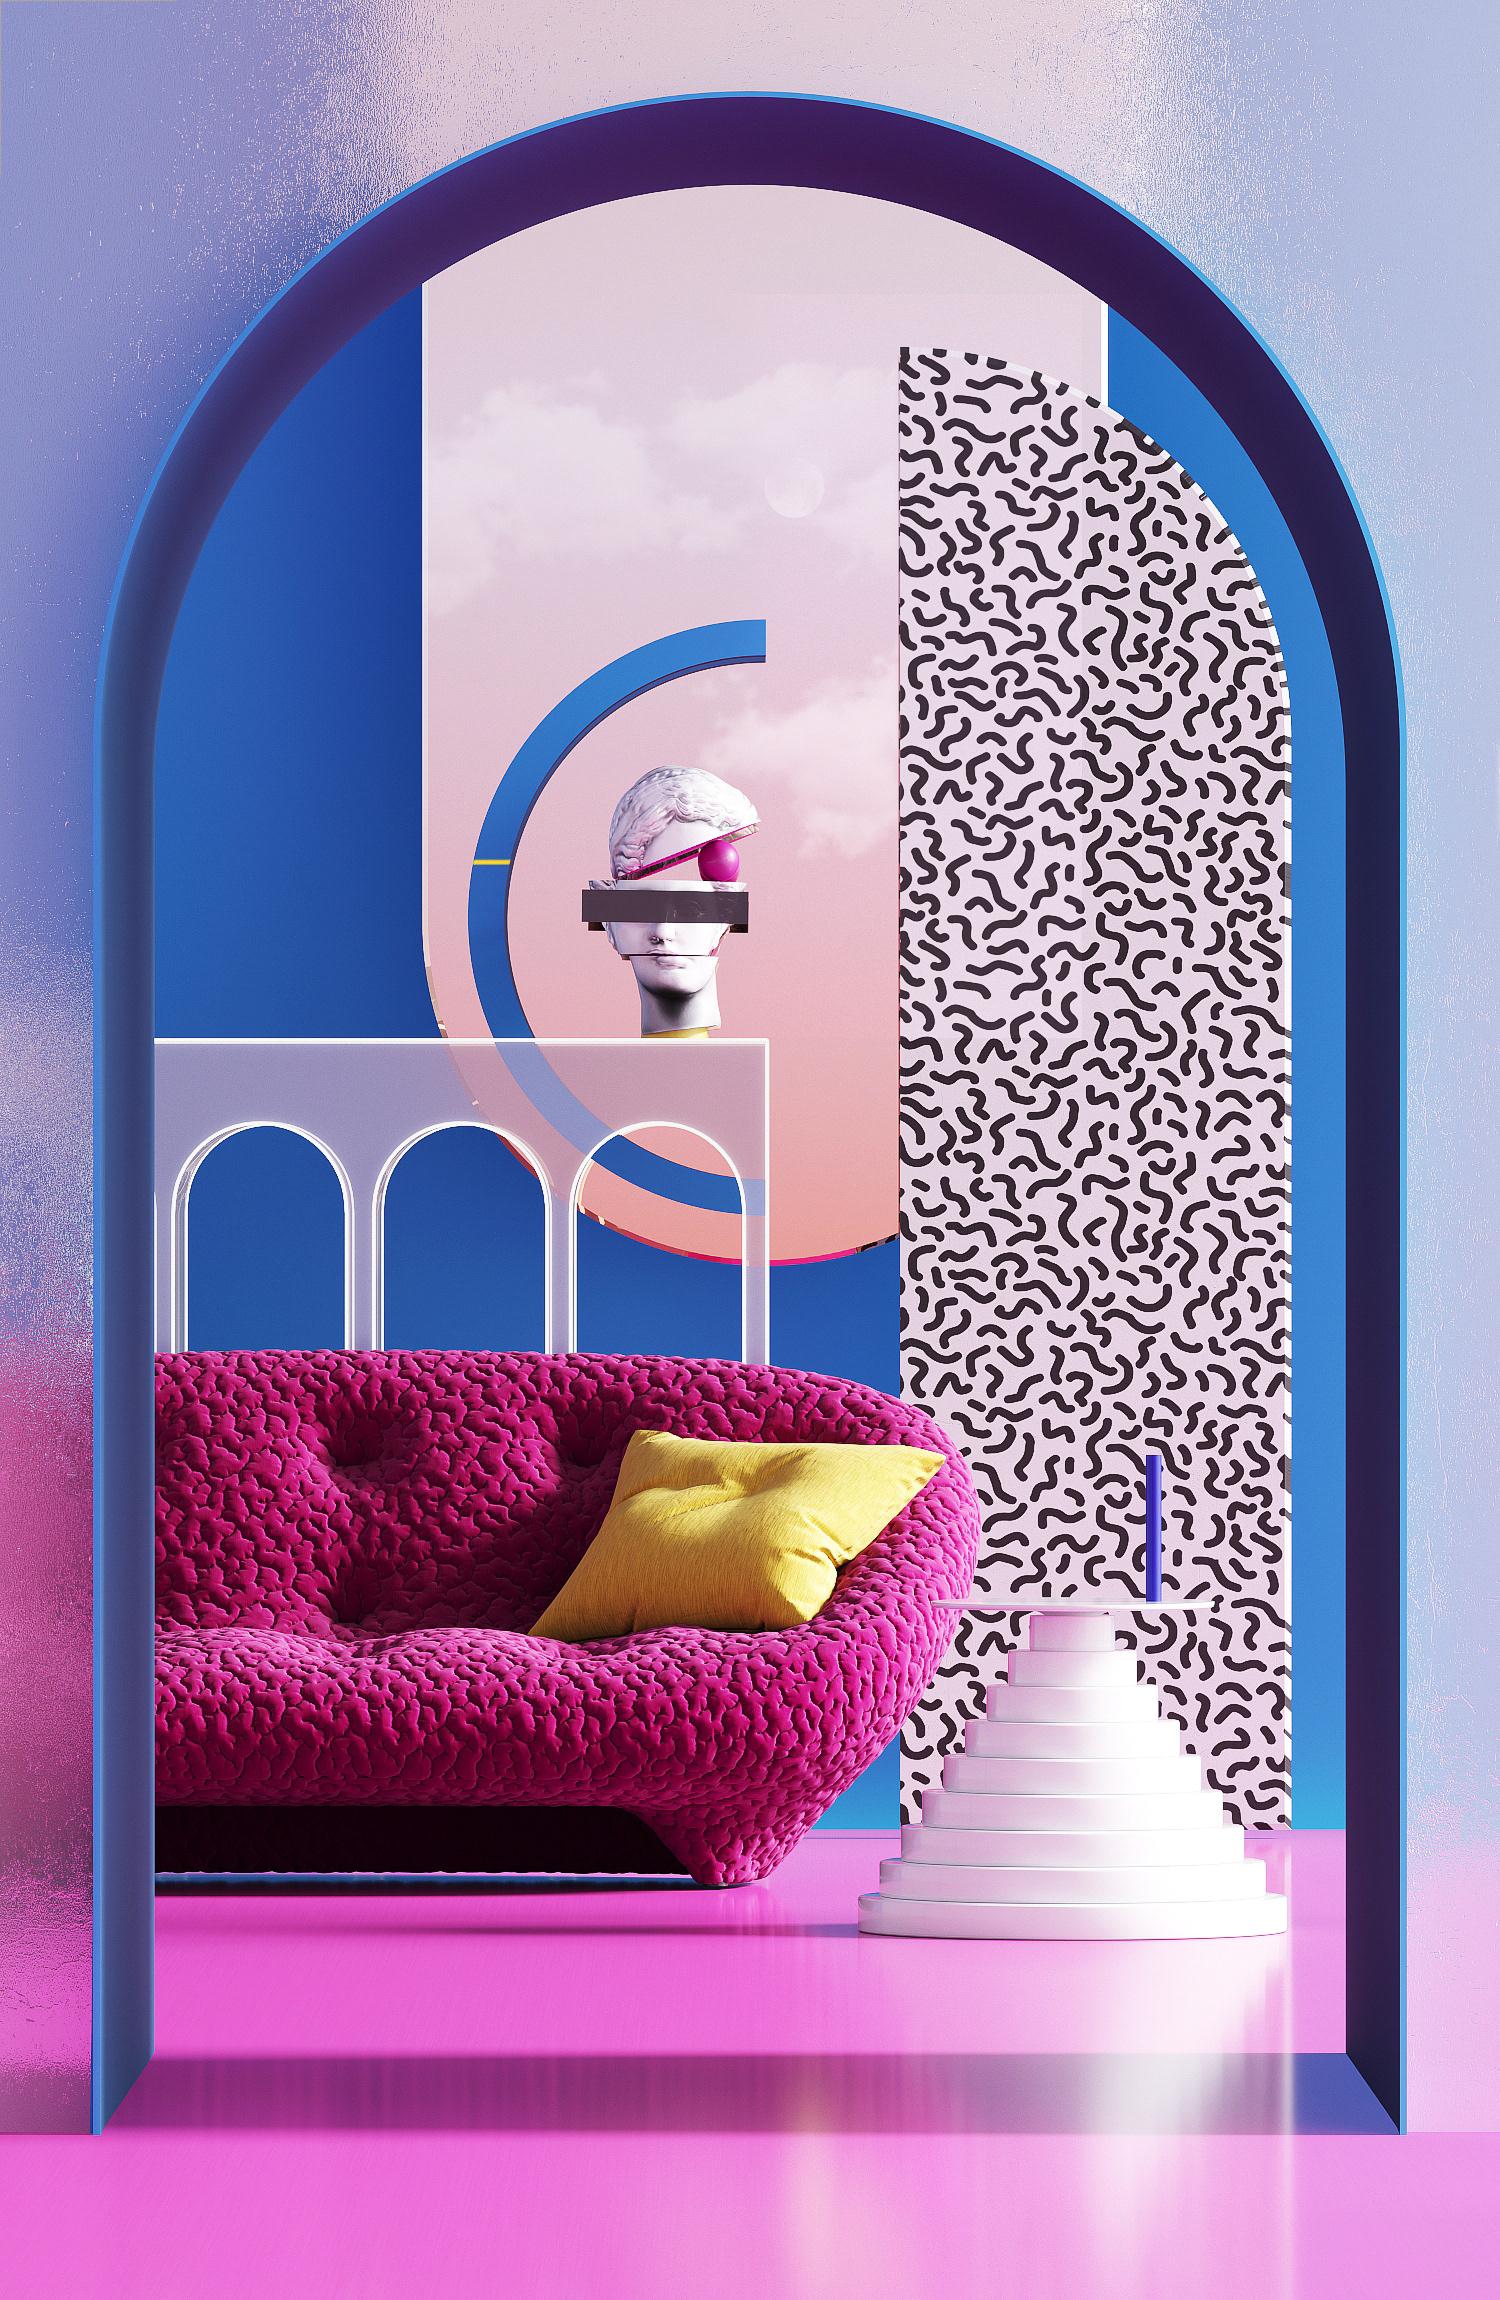 Interior Design and Digital Art and Illustration